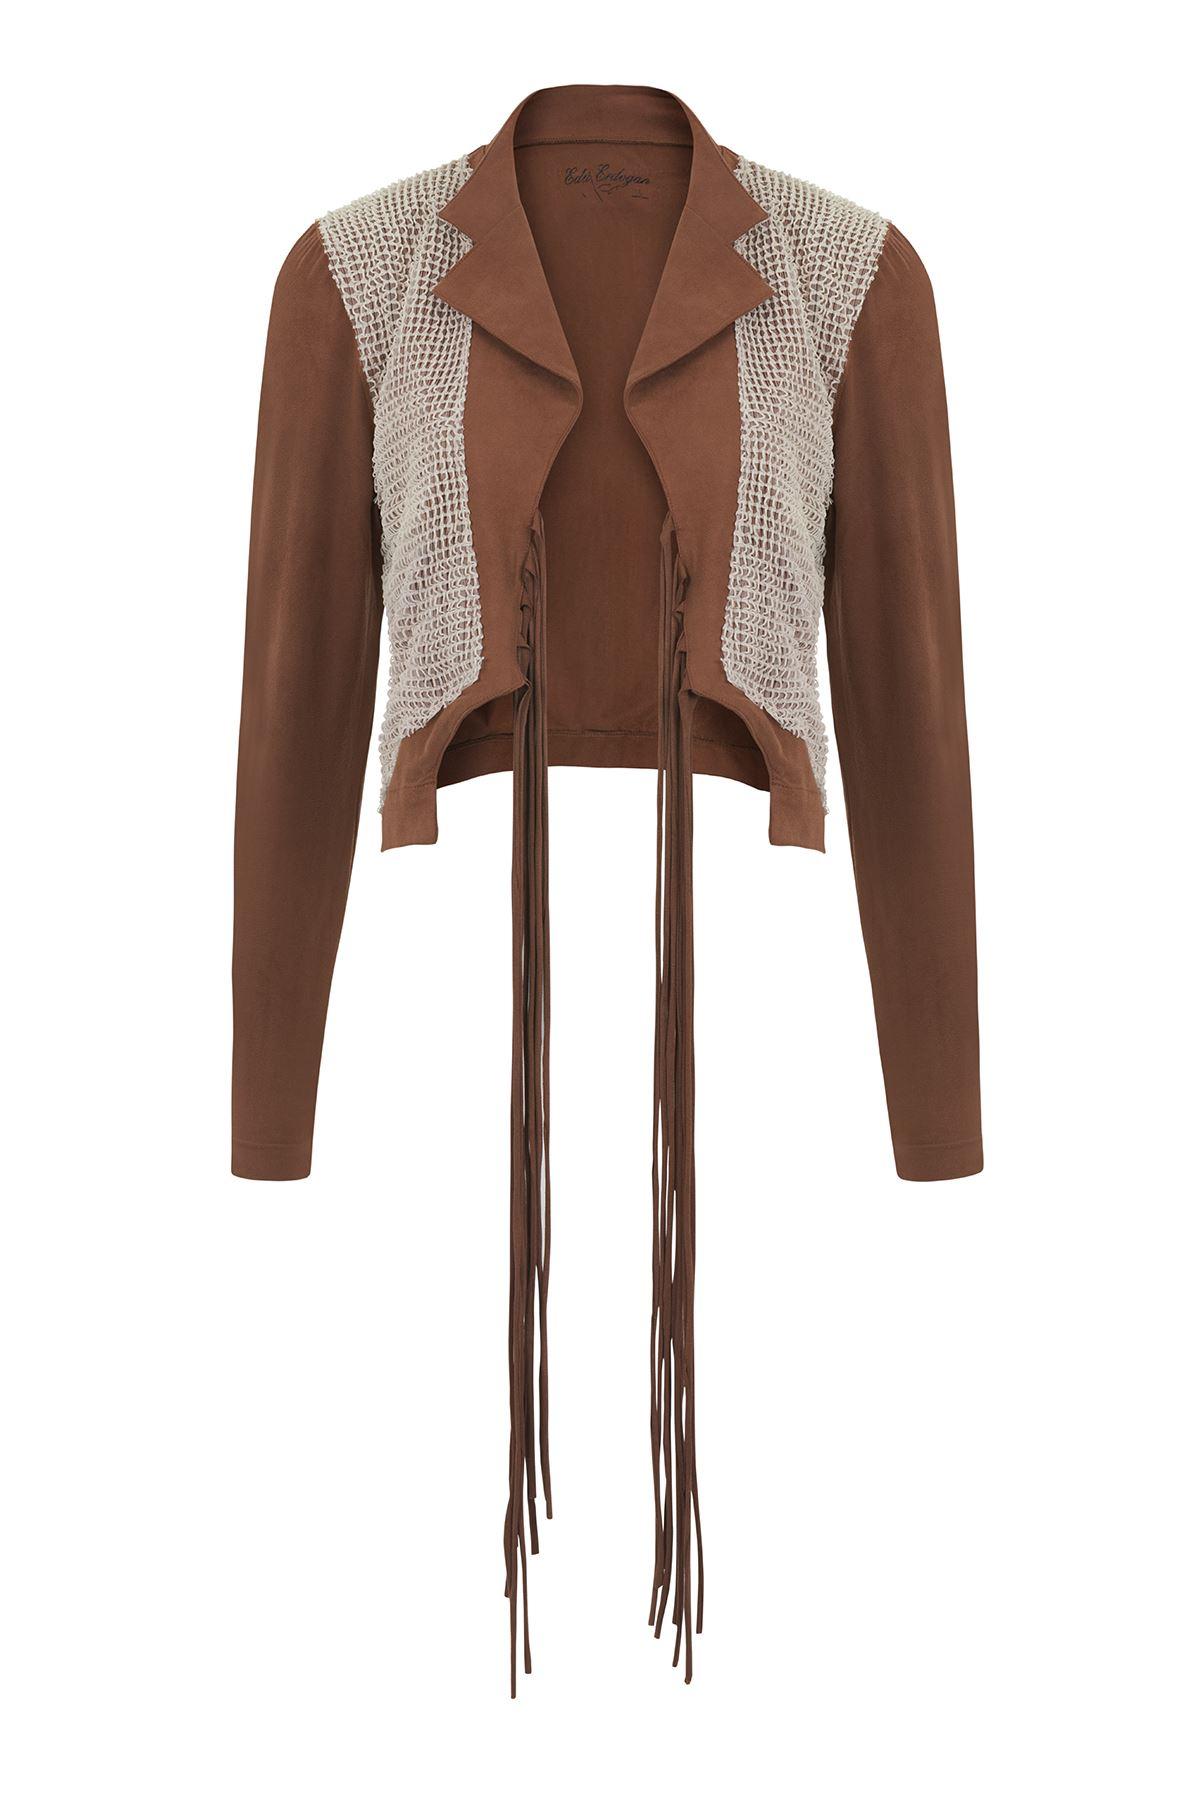 File Detaylı Süet Ceket